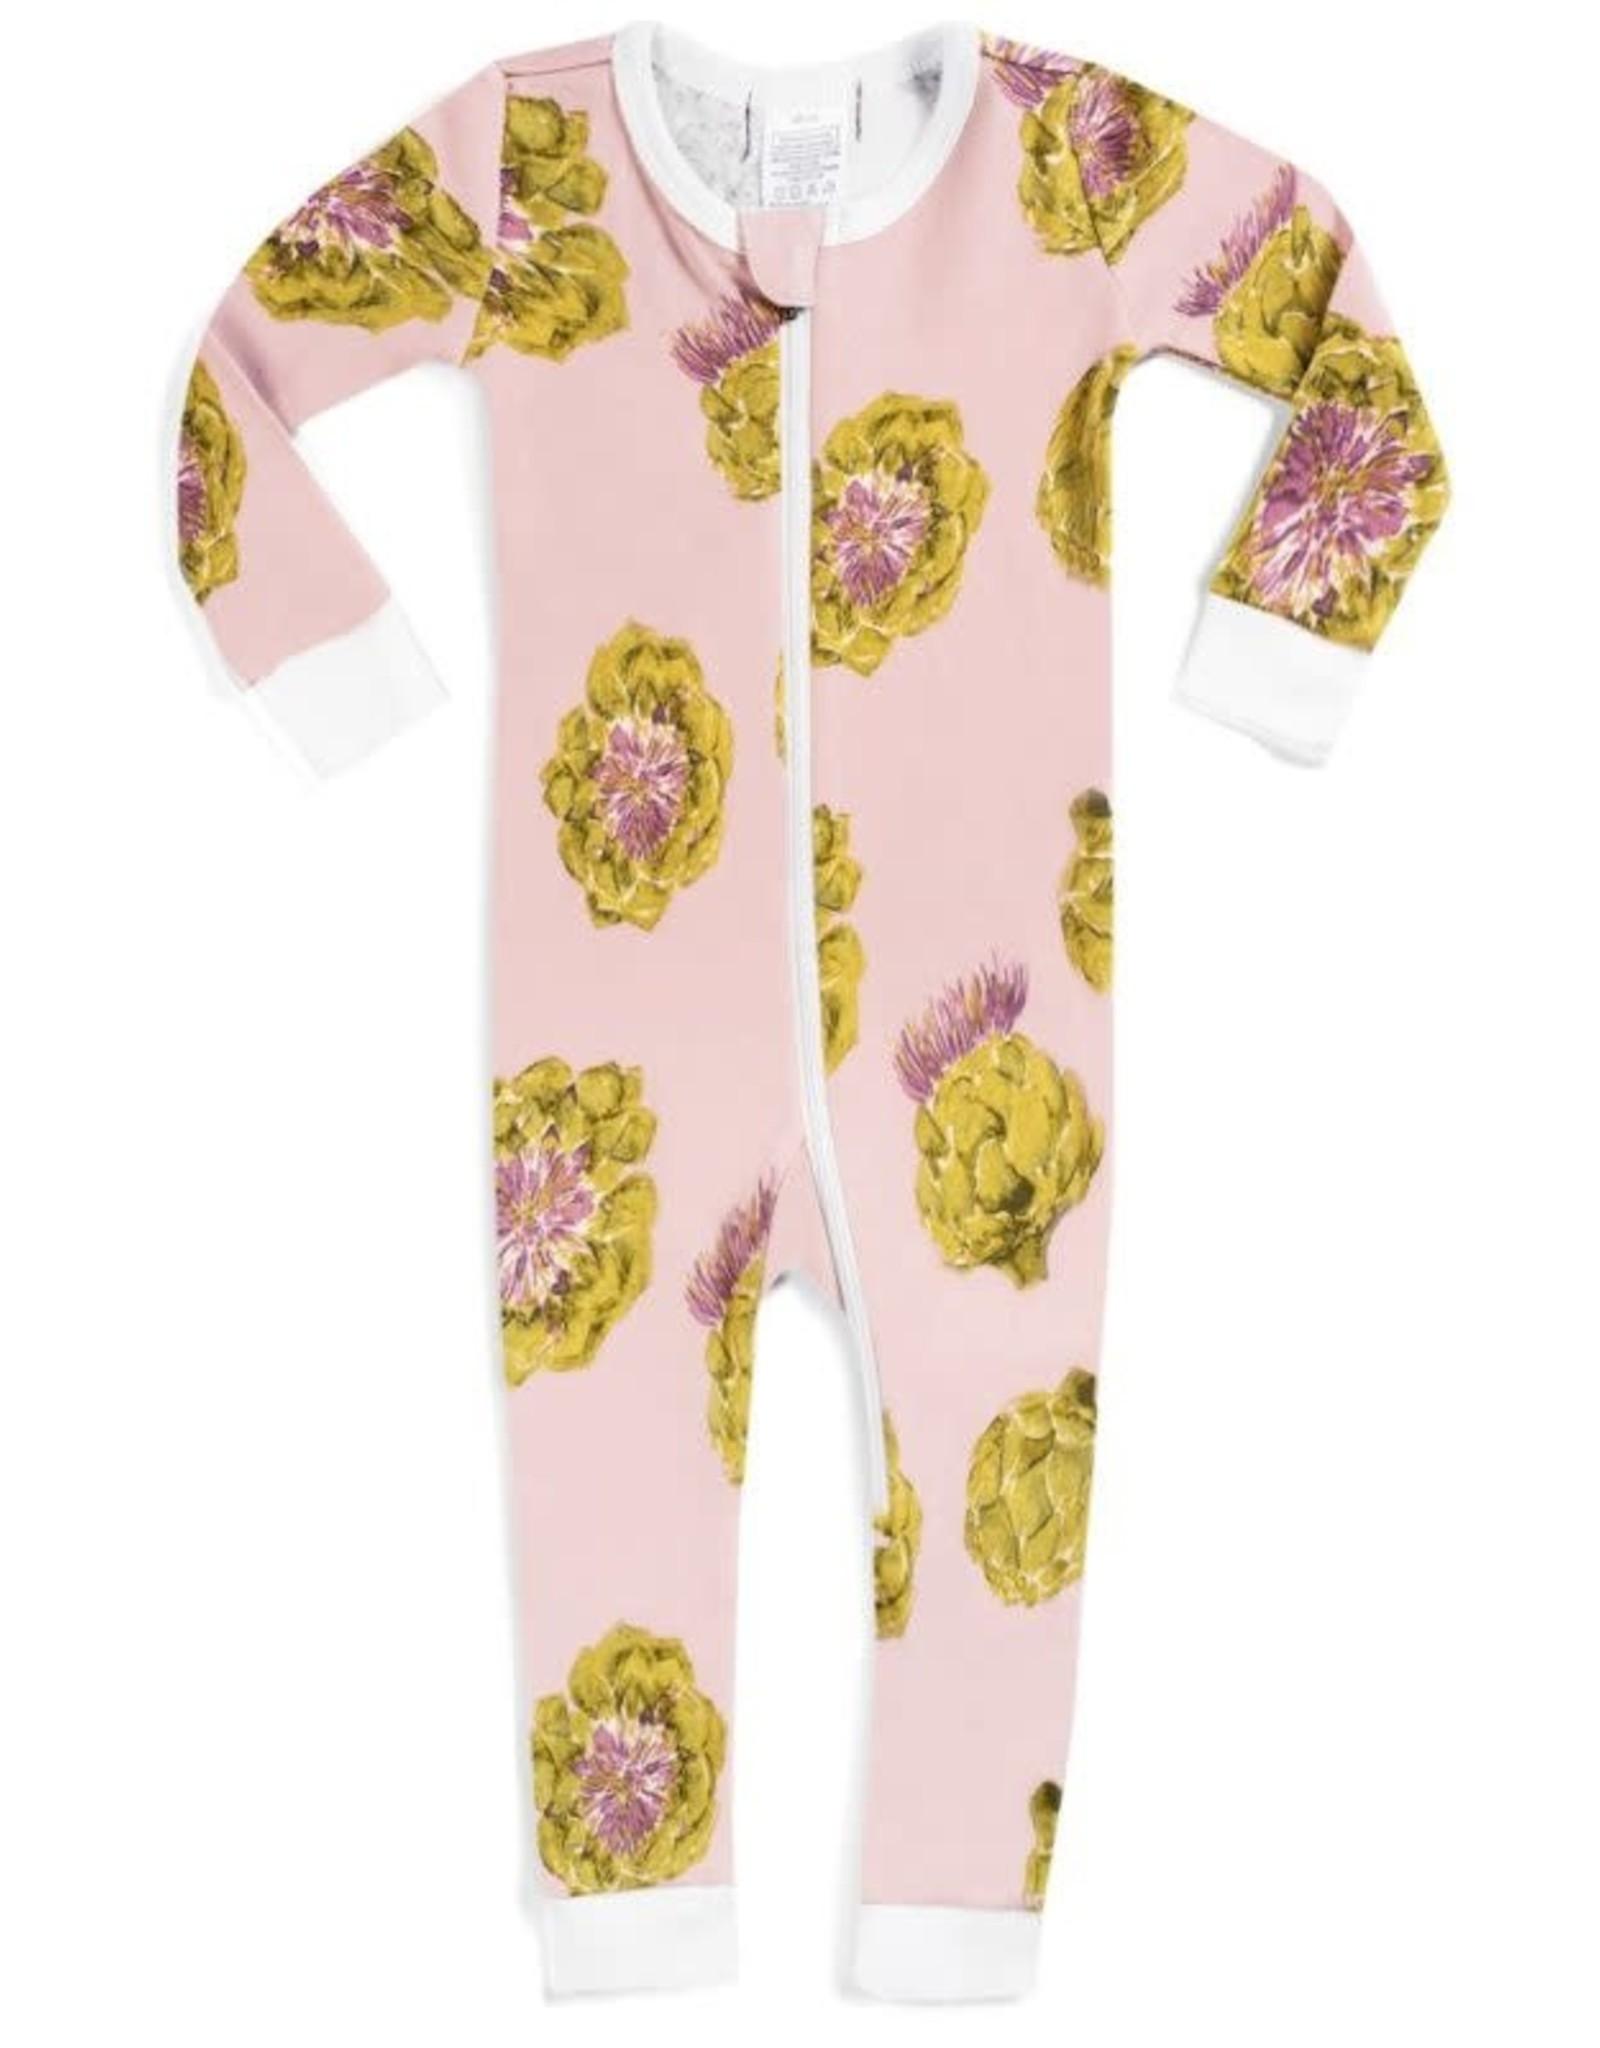 Milkbarn Milkbarn Organic Zipper Pajama